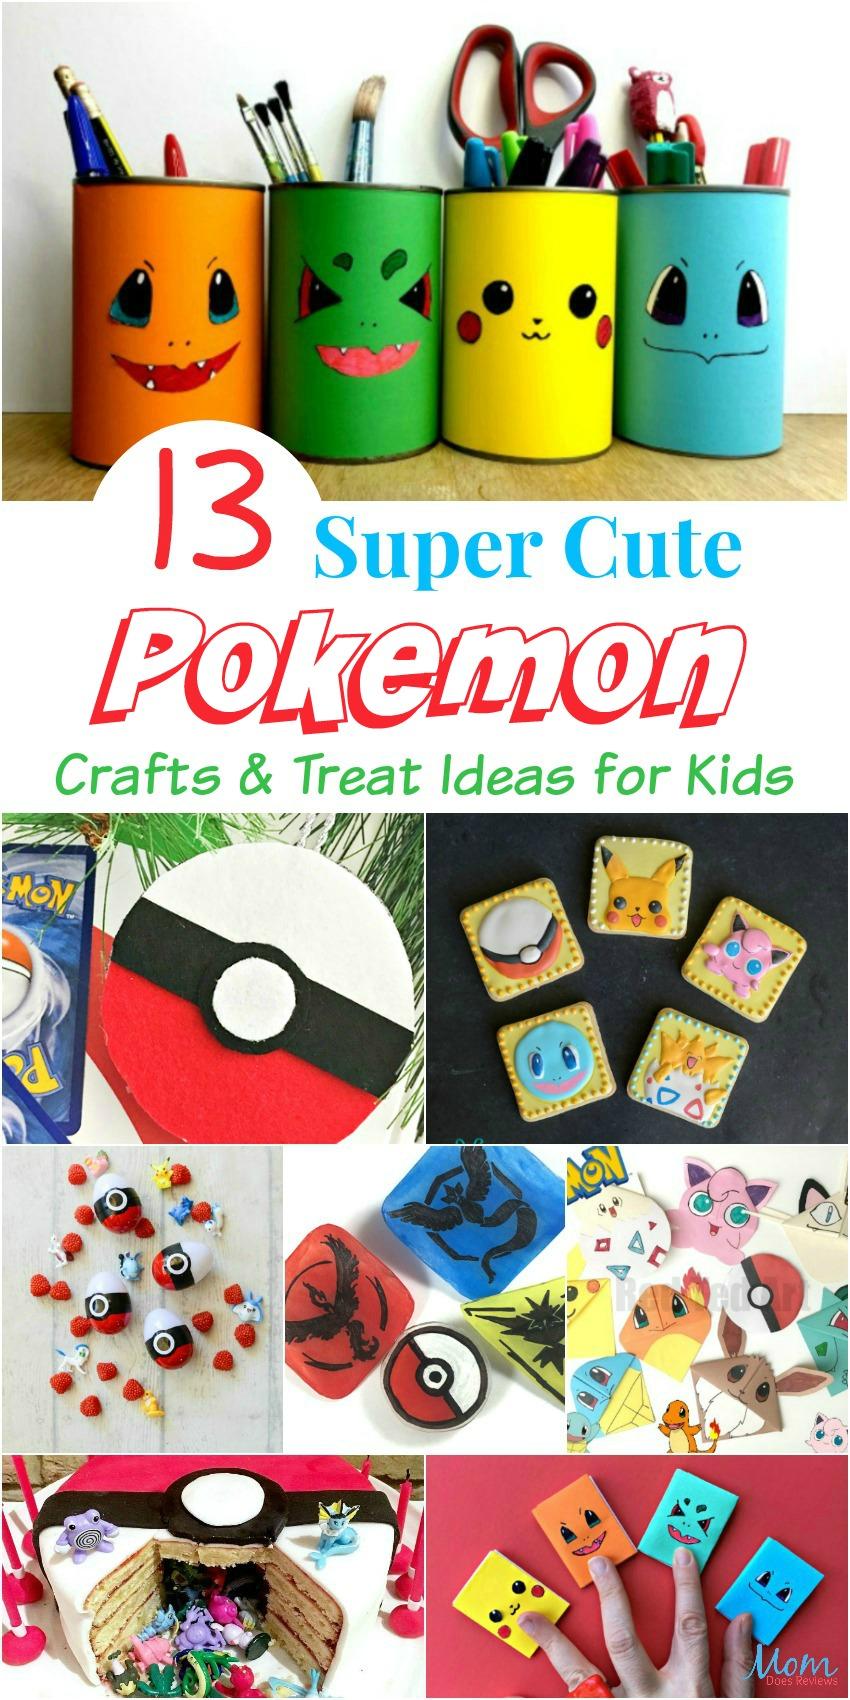 13 Super Cute Pokemon Crafts & Treat Ideas for Kids #funstuff #pokemon #crafts #pikachu